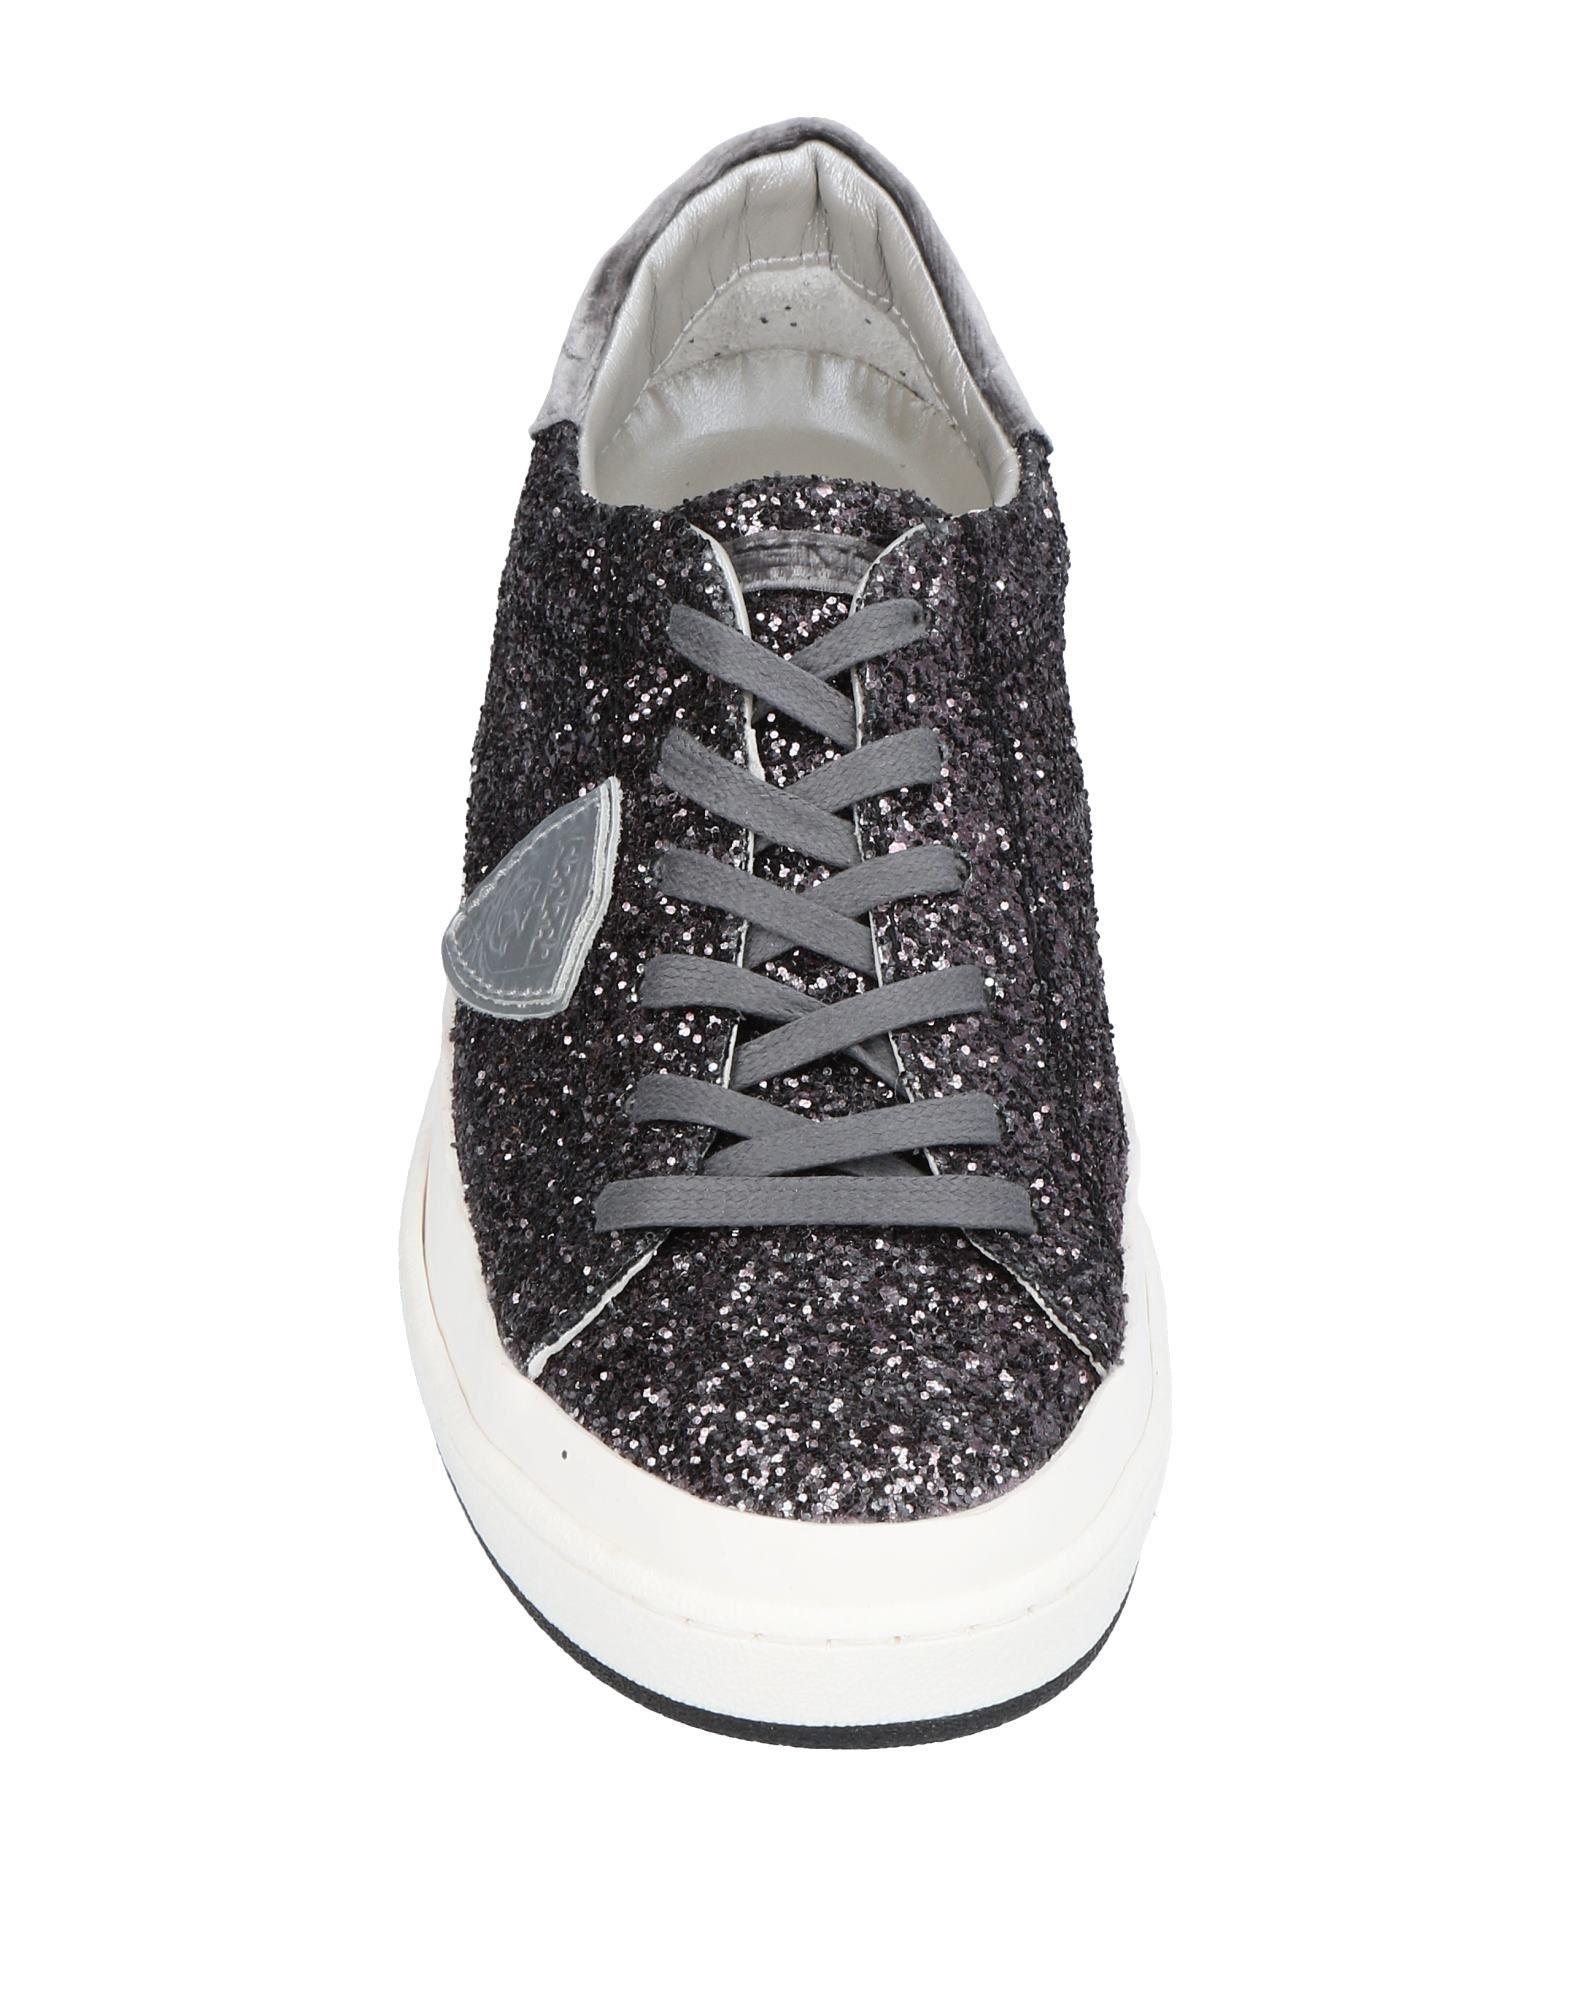 Philippe Model Damen Sneakers Damen Model  11459504XB Neue Schuhe aaf8e8